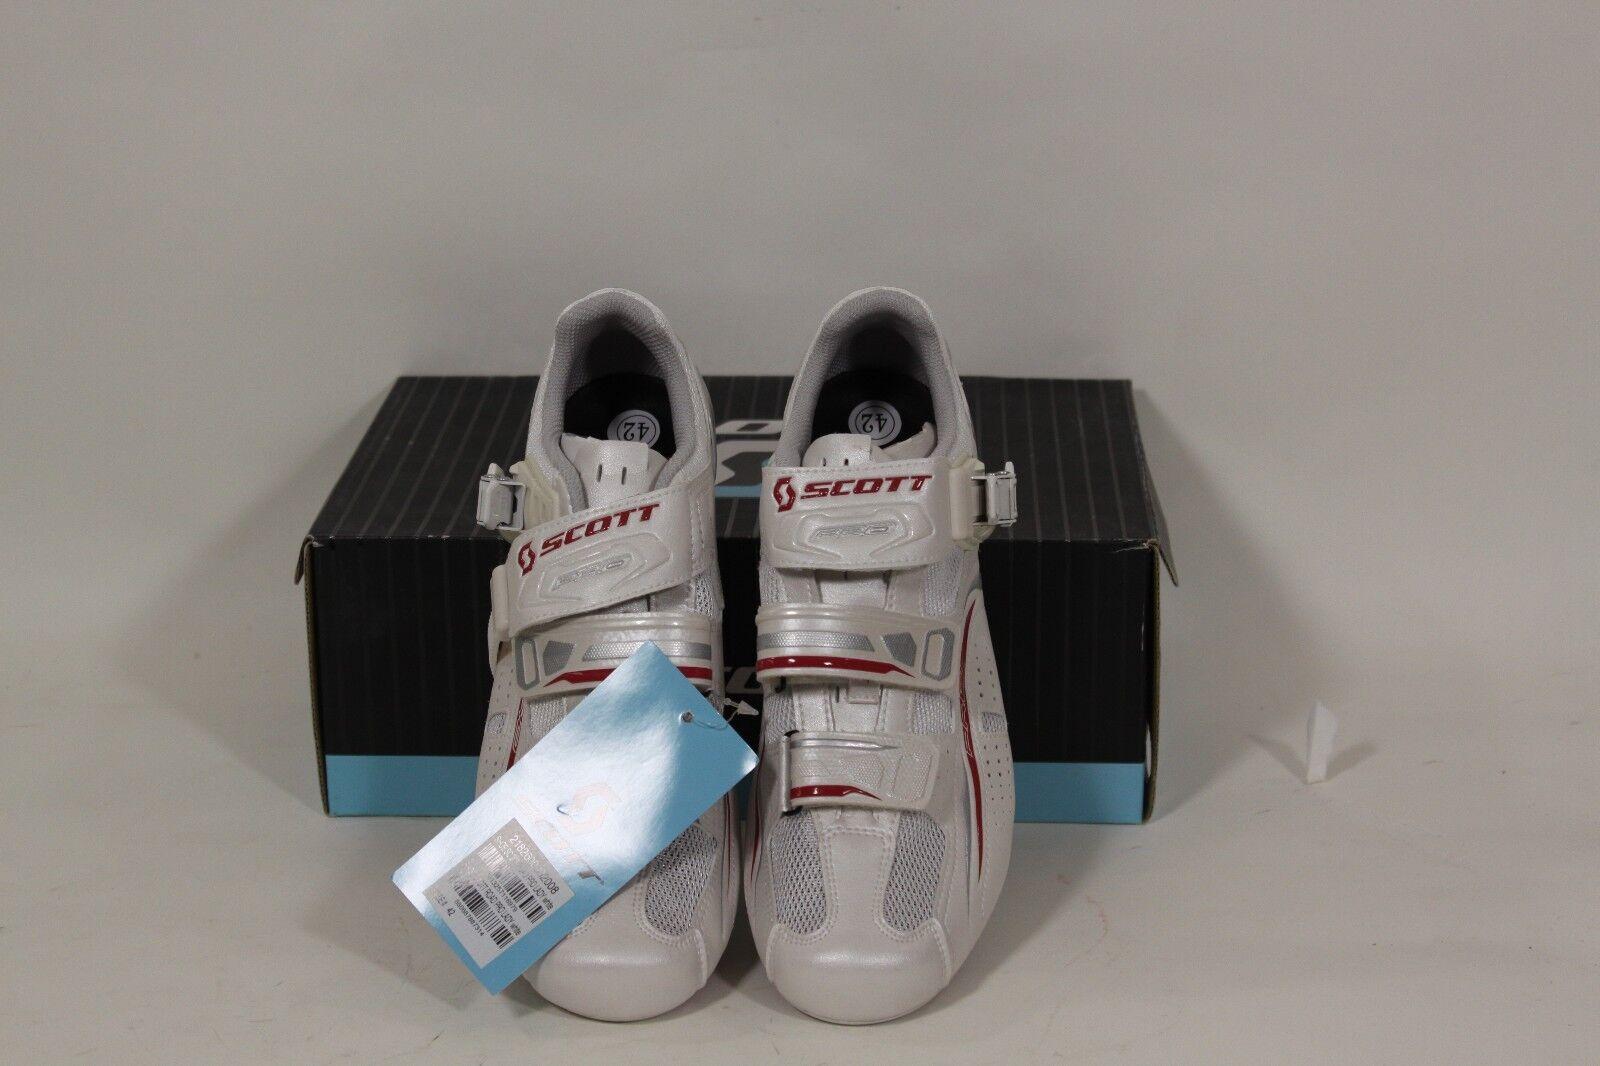 Scott Road Pro Lady Bike scarpe bianca Eu 36 or US 5